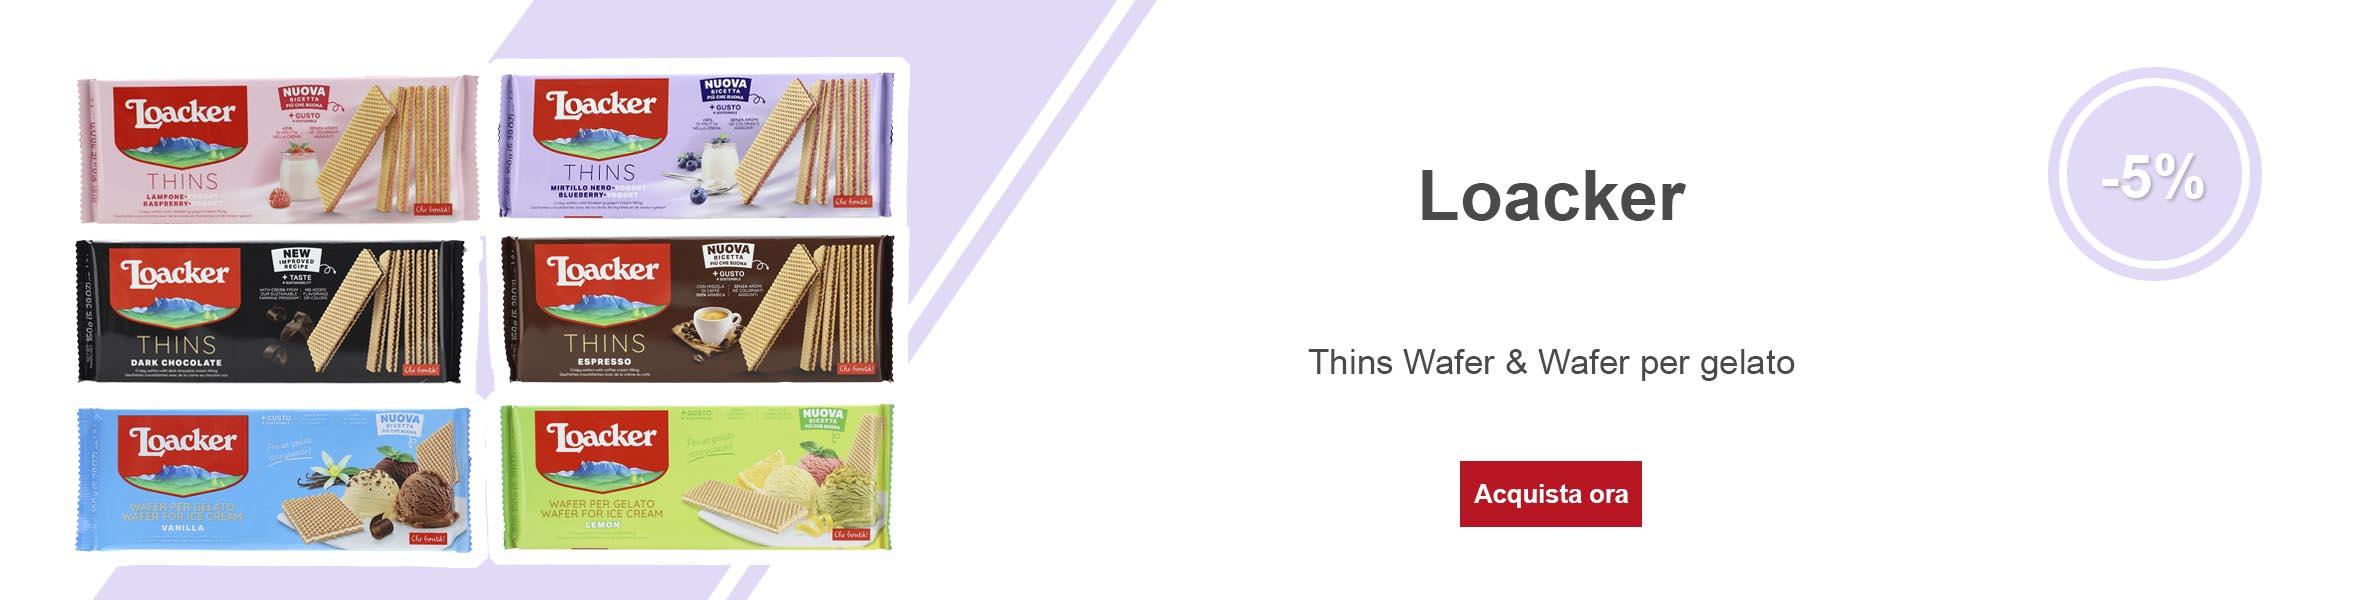 Loacker Thins & Wafer per Gelato 150g